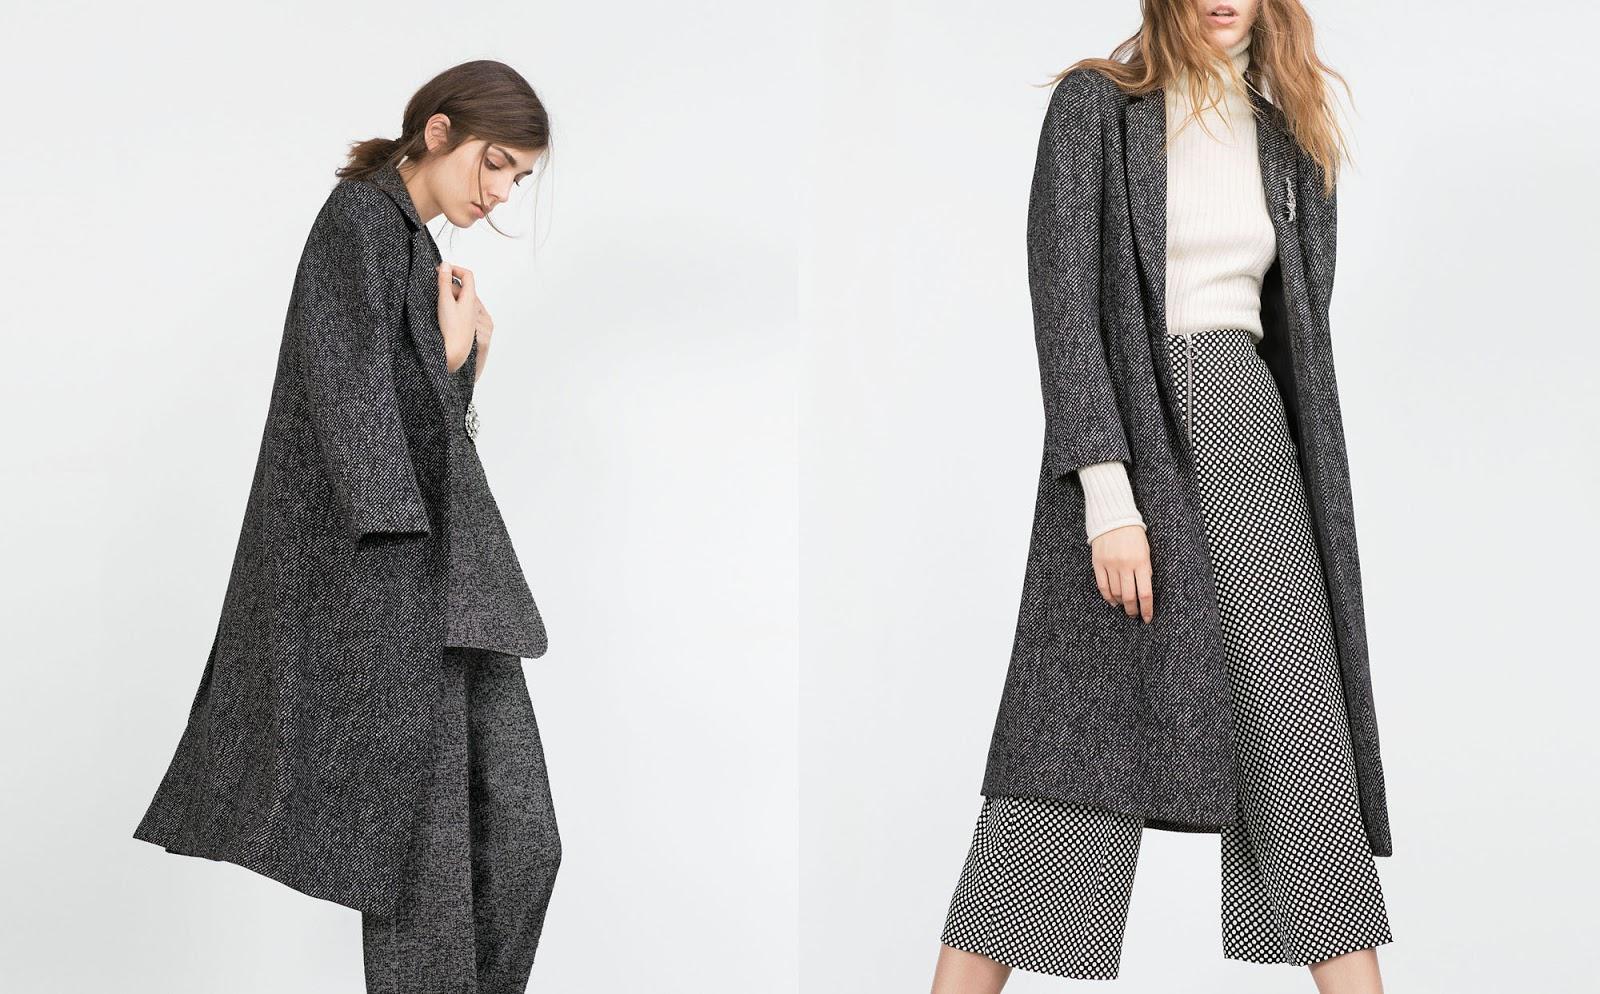 Eniwhere Fashion - Zara's Wishlist - Natale